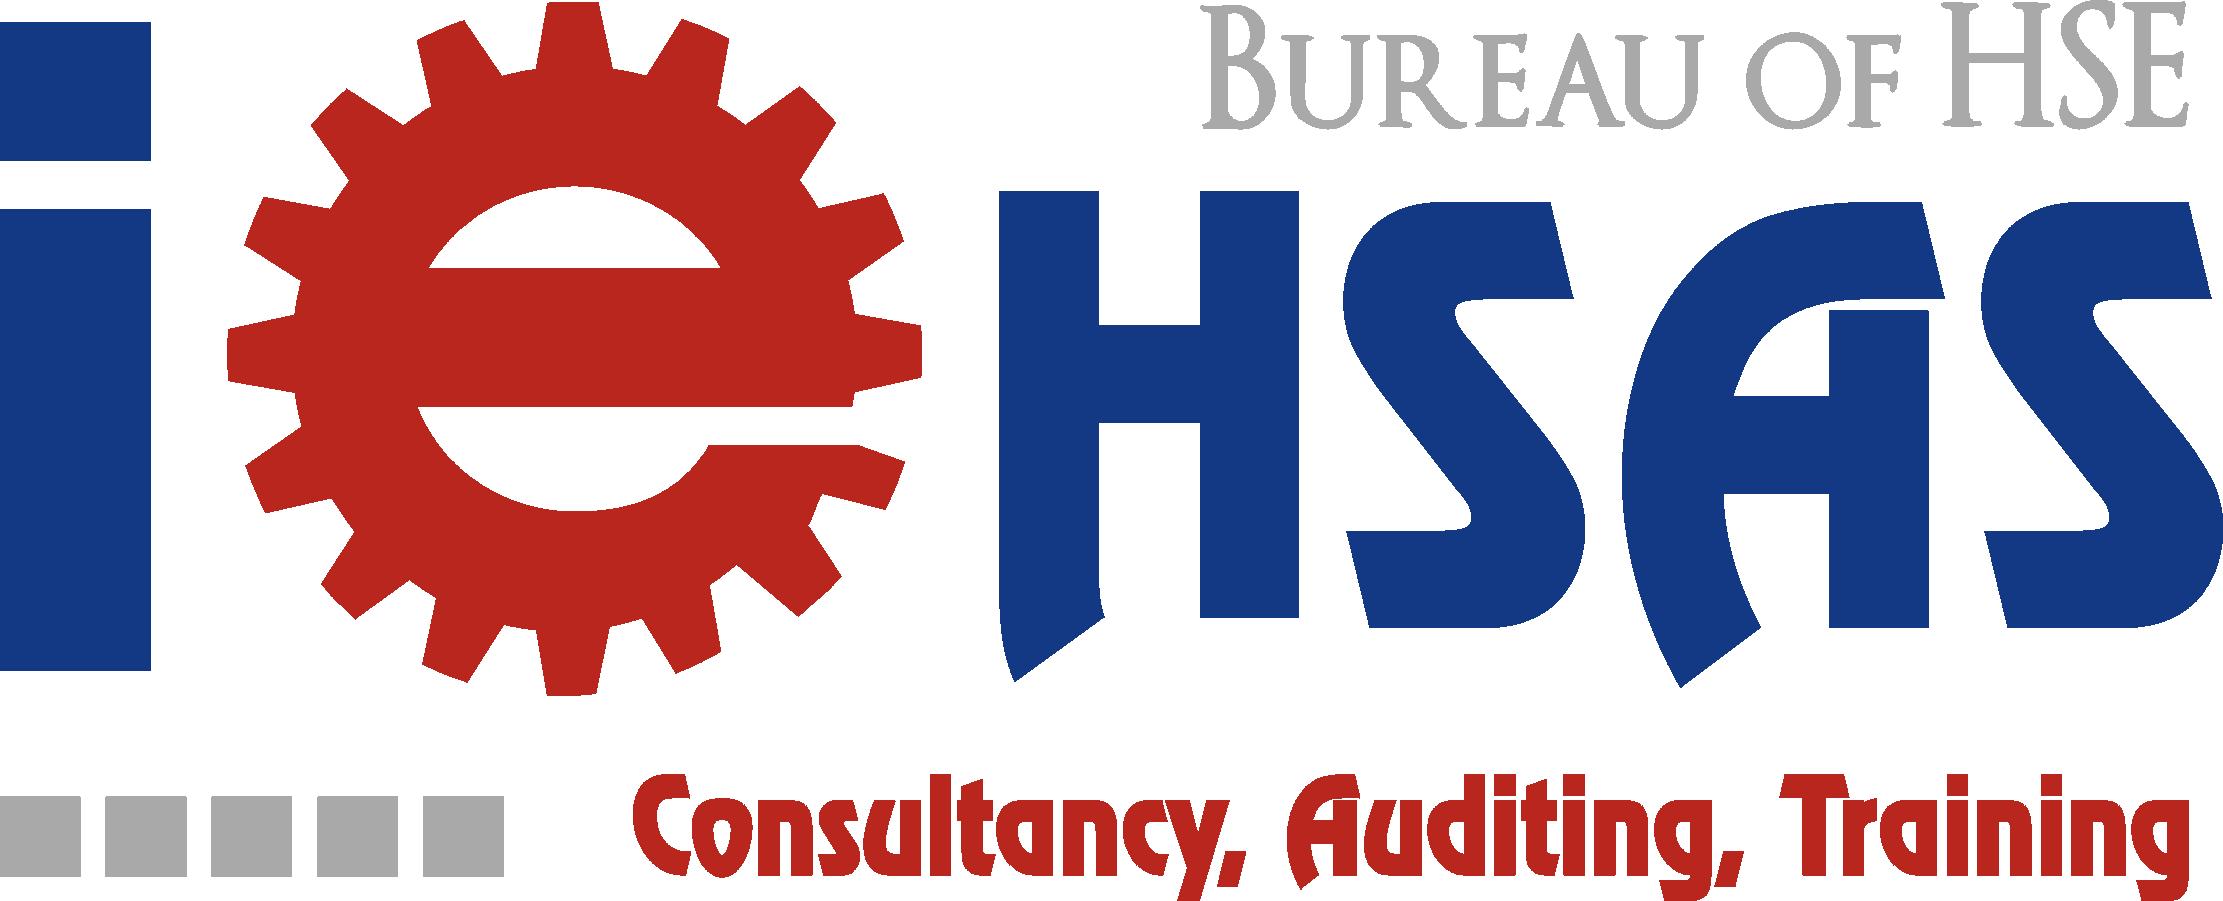 IEHSAS - Health Safety & Environment